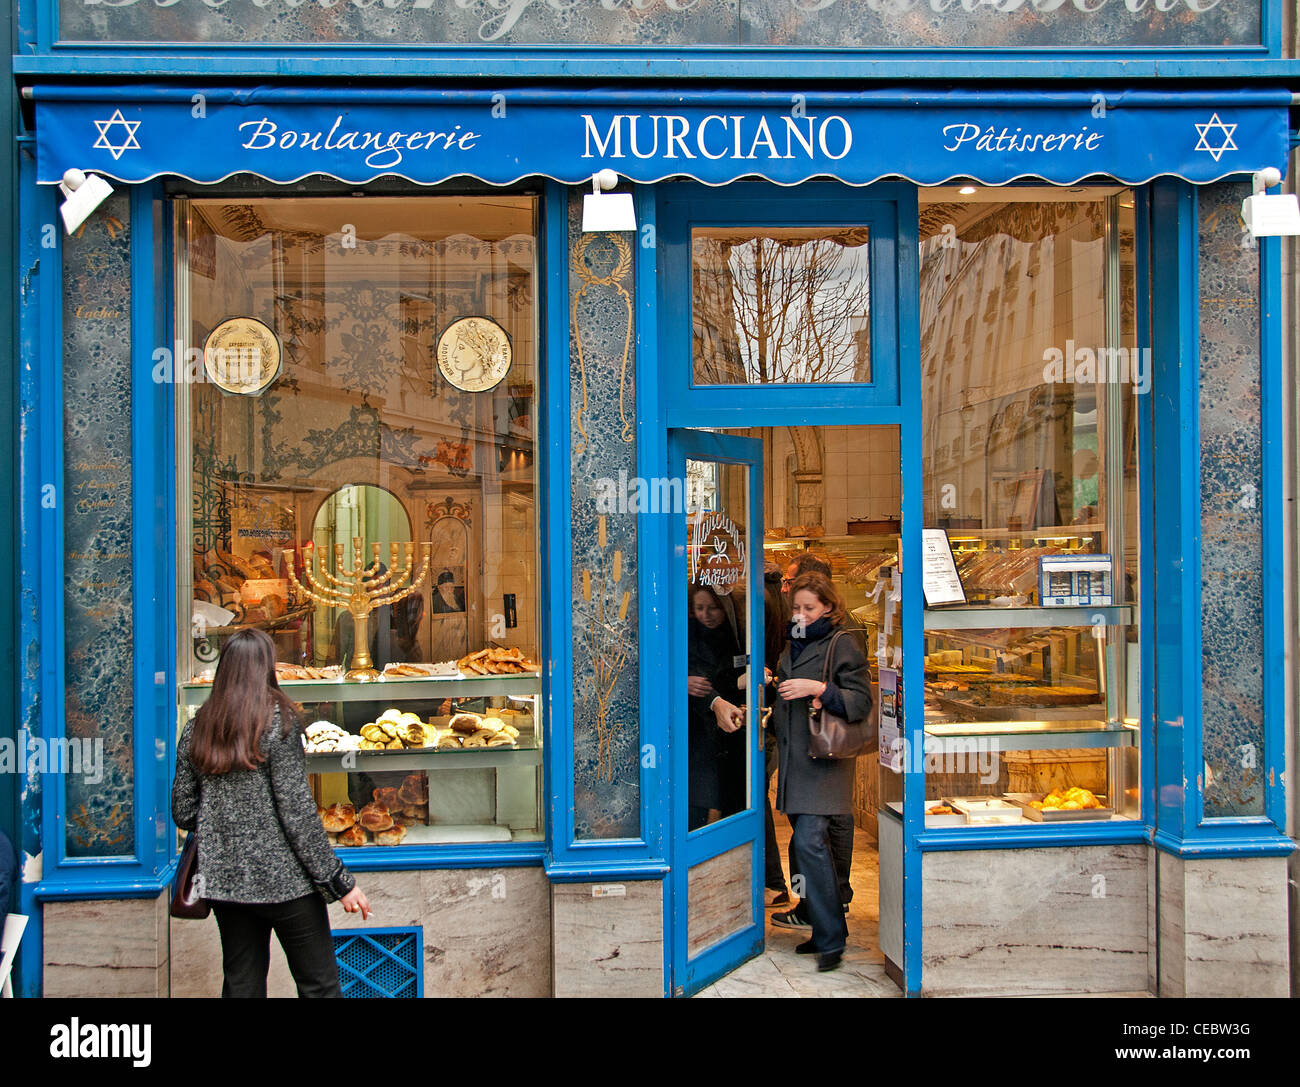 Murciano Boulangerie Patisserie Jewish Bakery  Marais Paris France - Stock Image